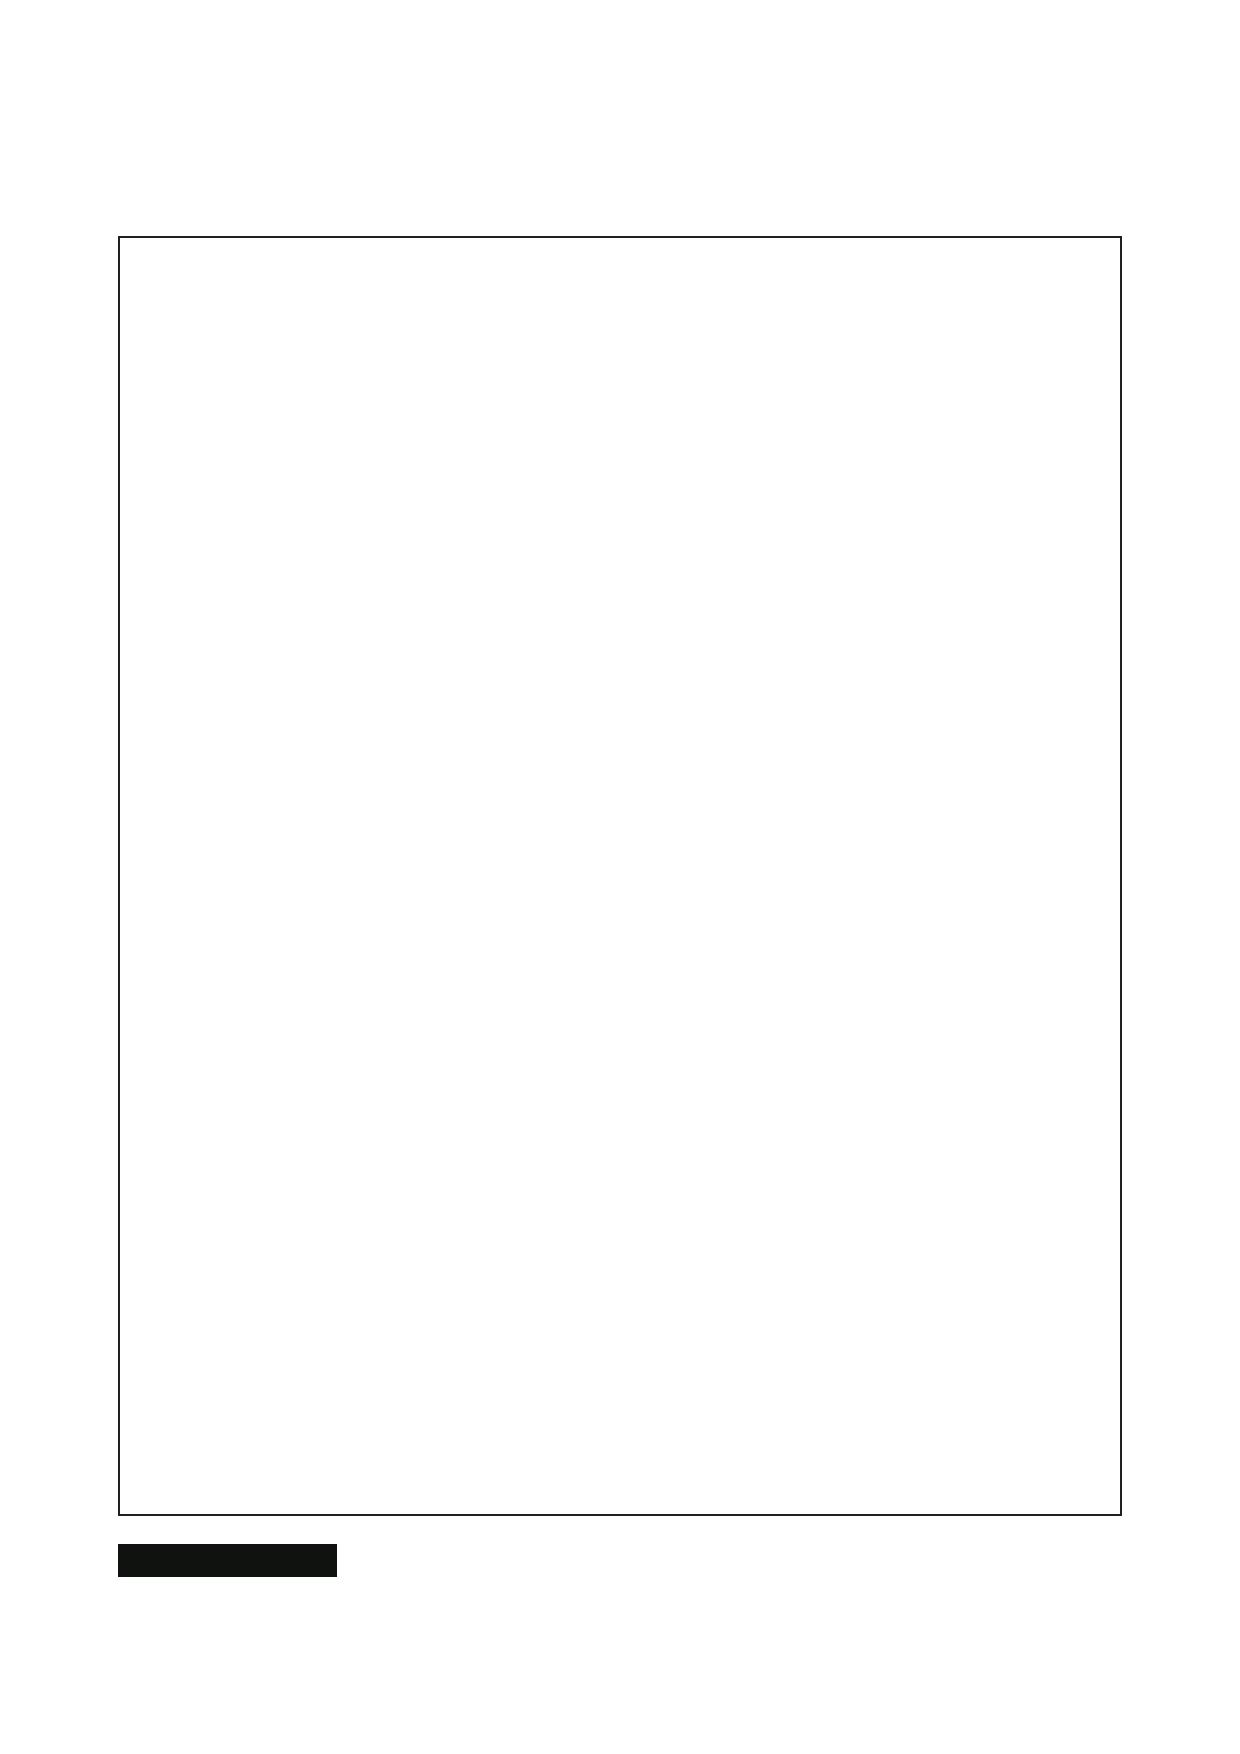 IT8518E pdf, 반도체, 판매, 대치품